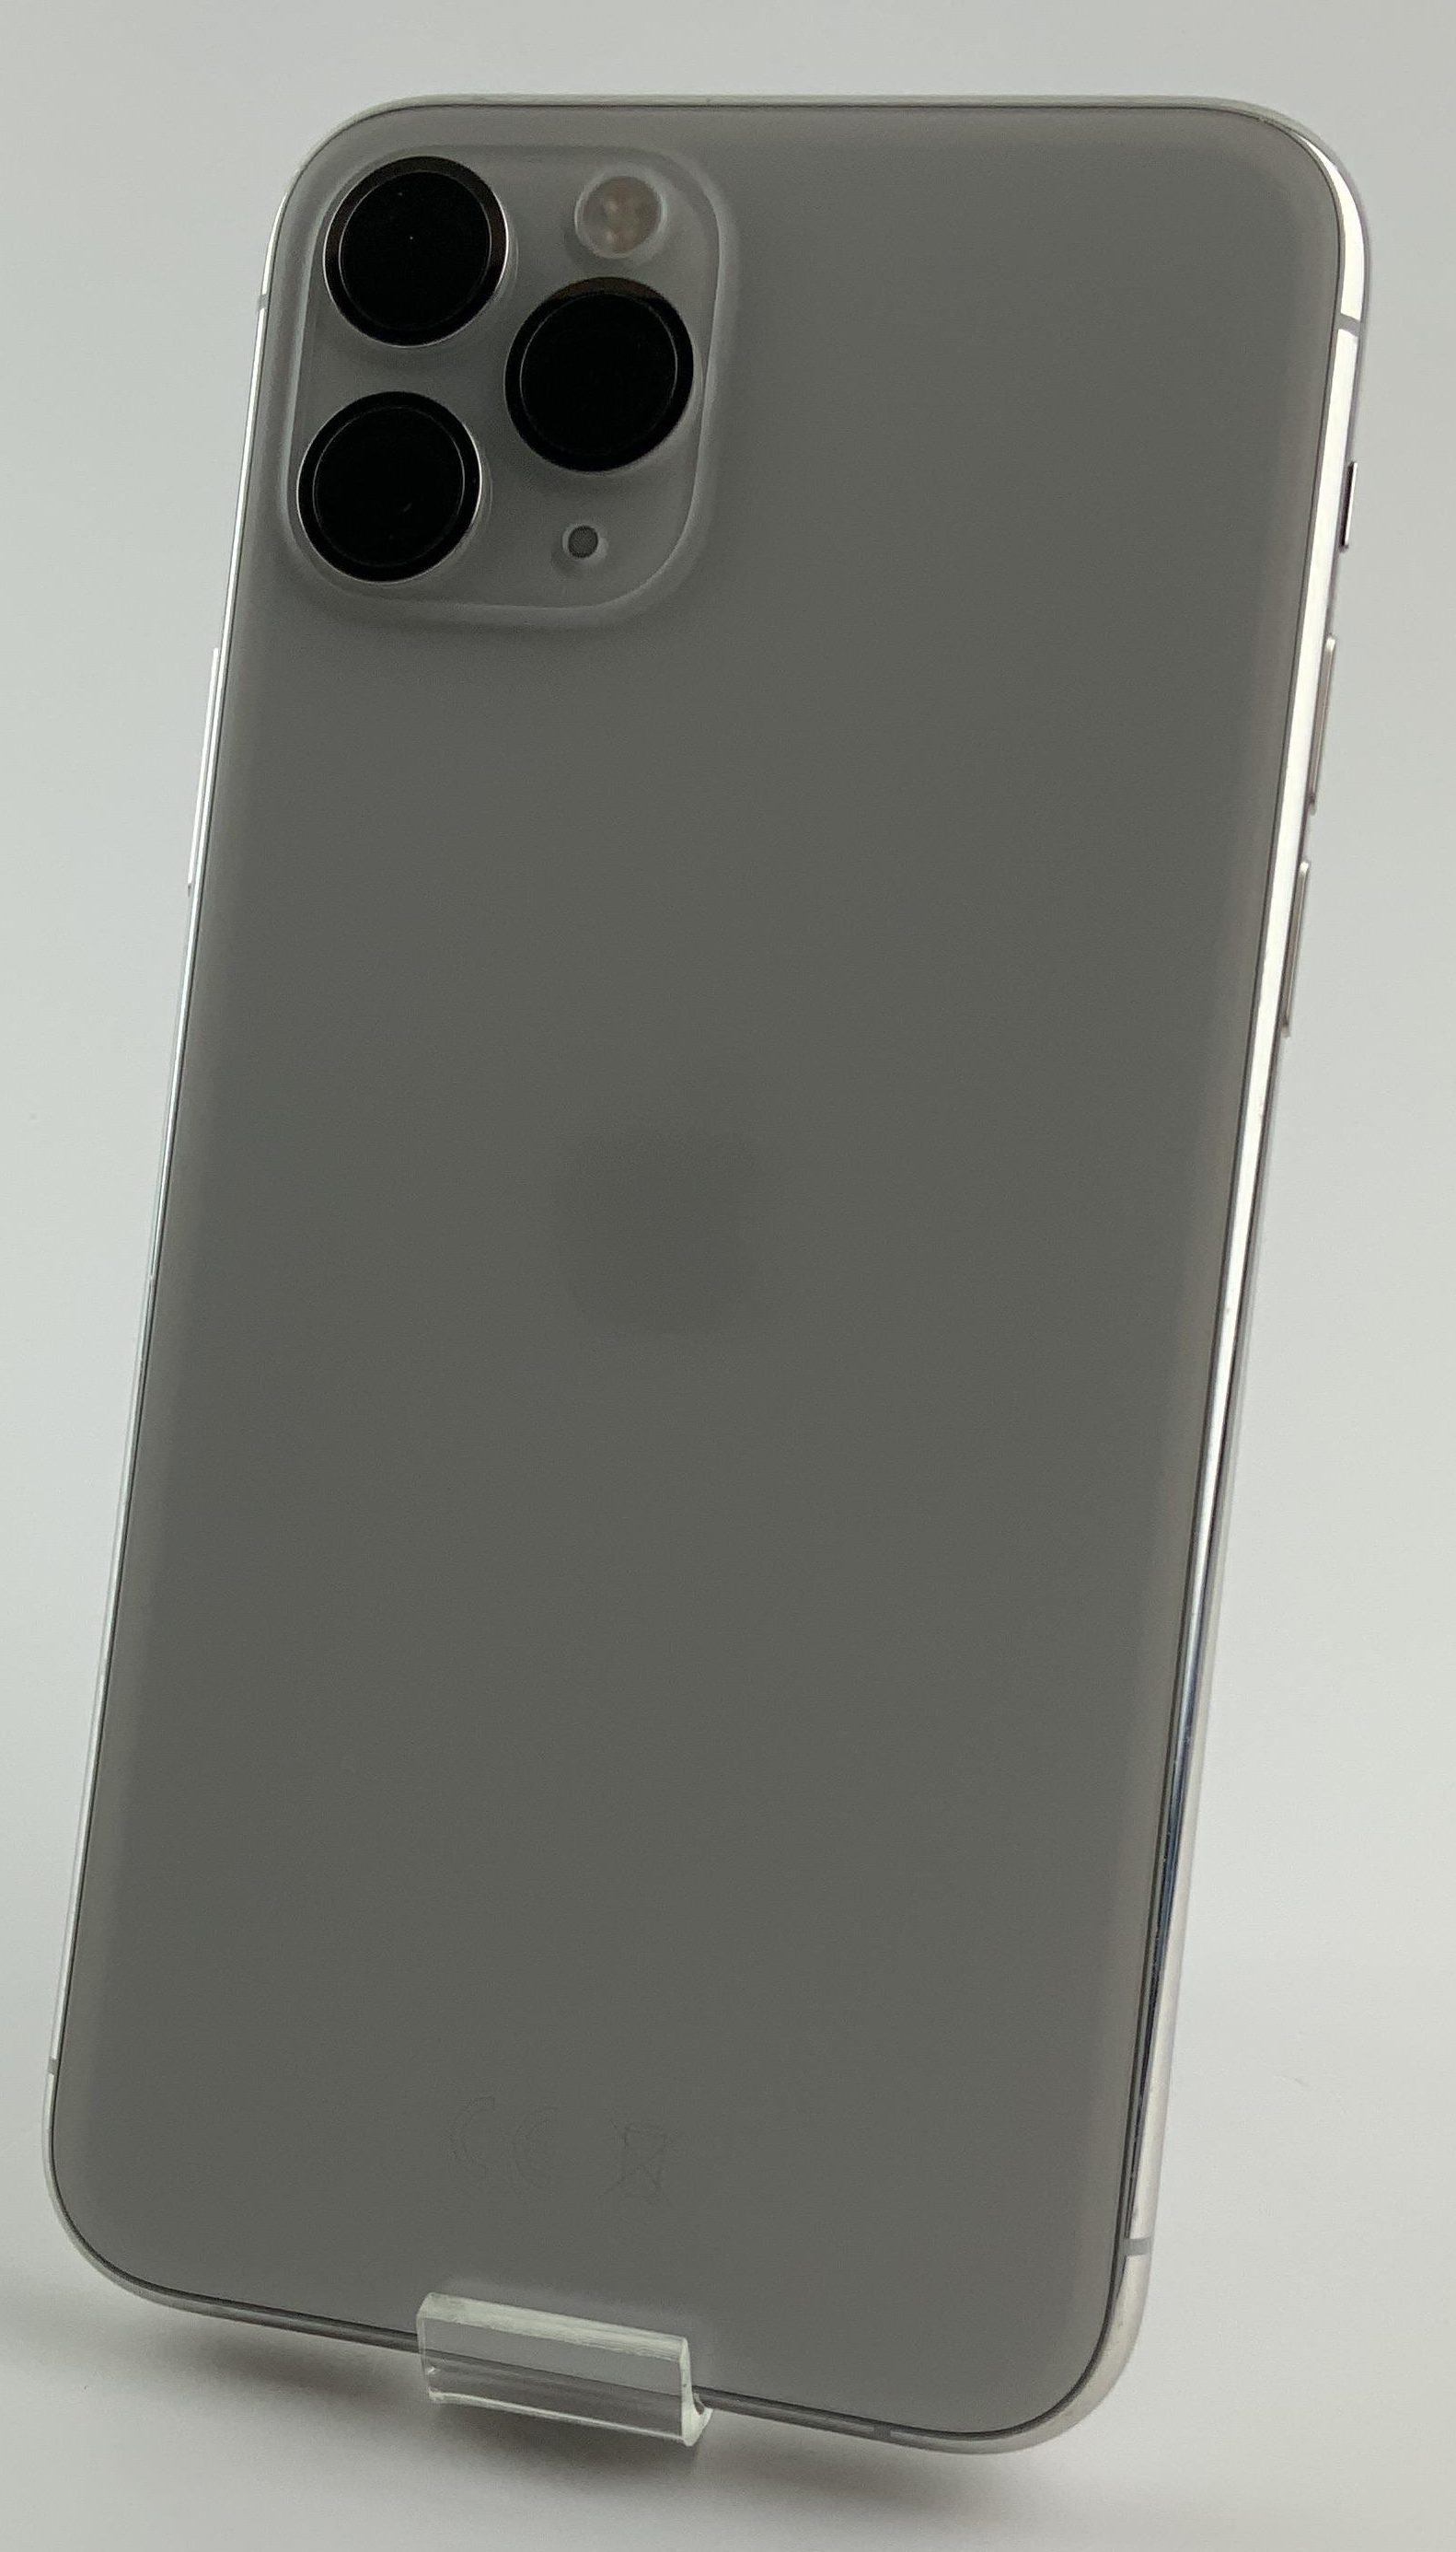 iPhone 11 Pro 64GB, 64GB, Silver, Bild 2